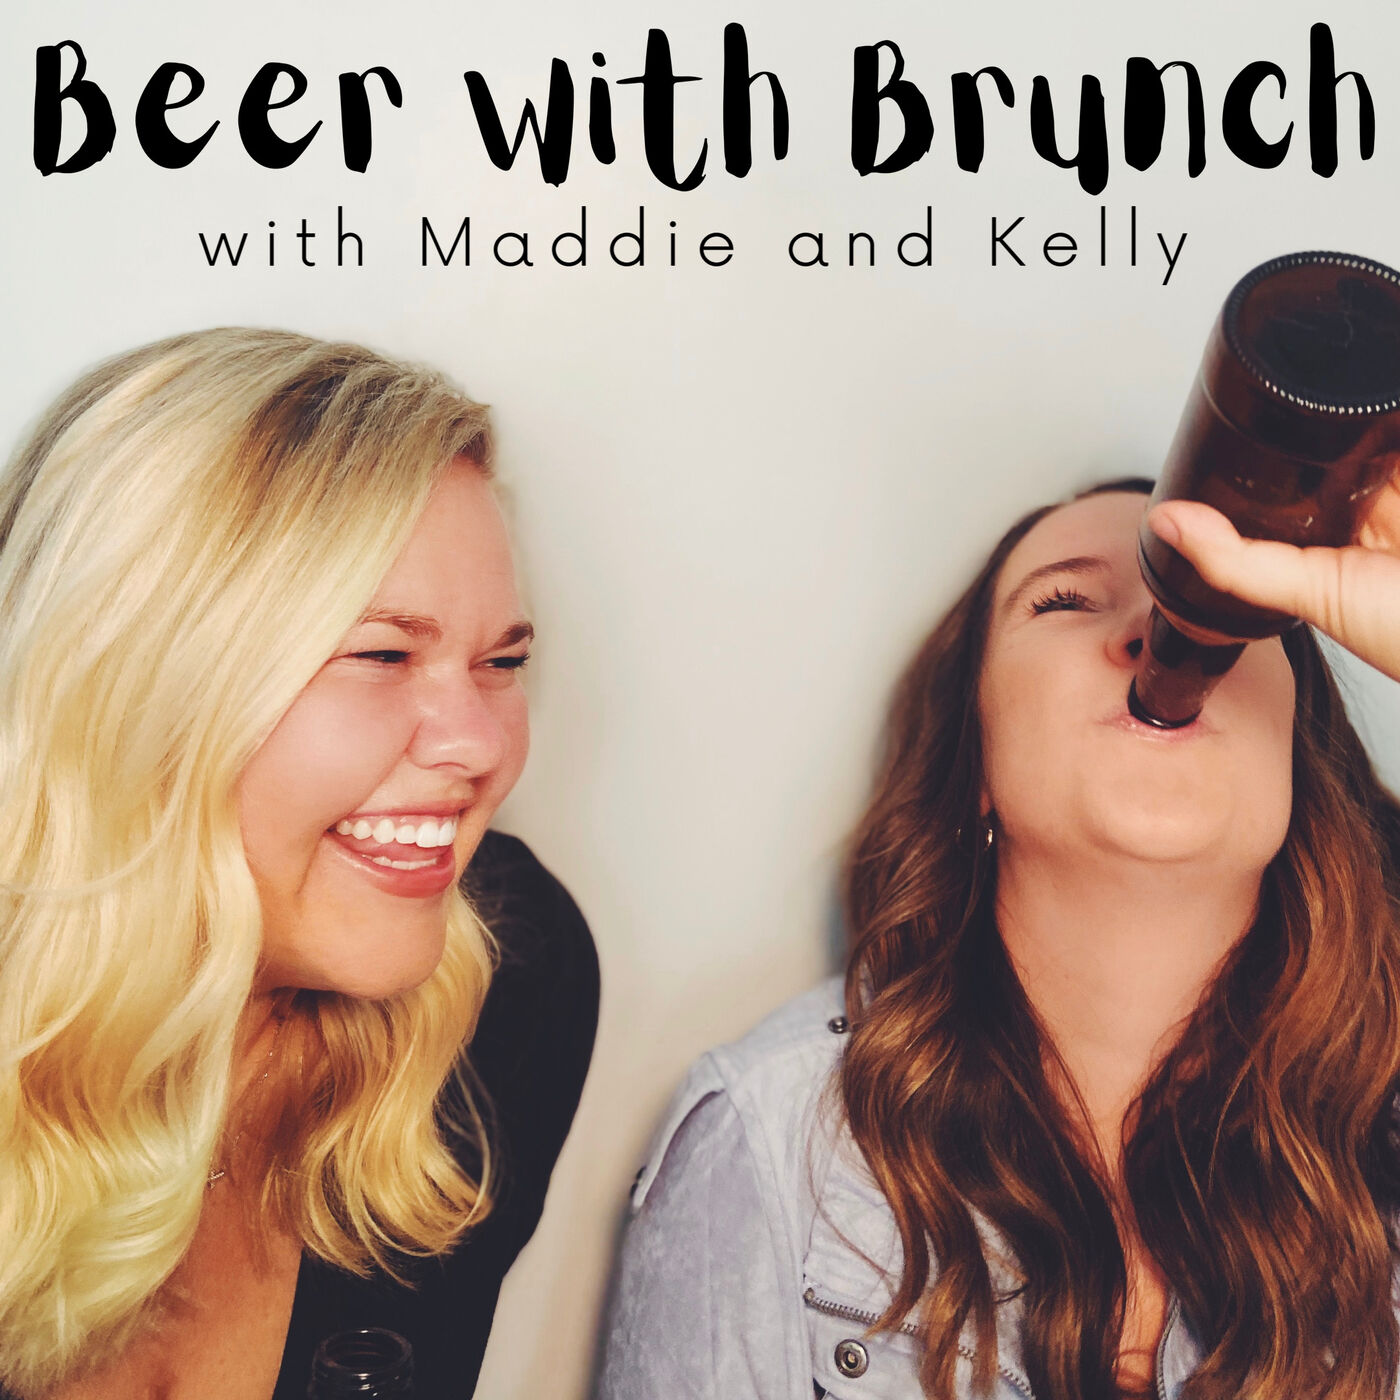 Beer With Brunch